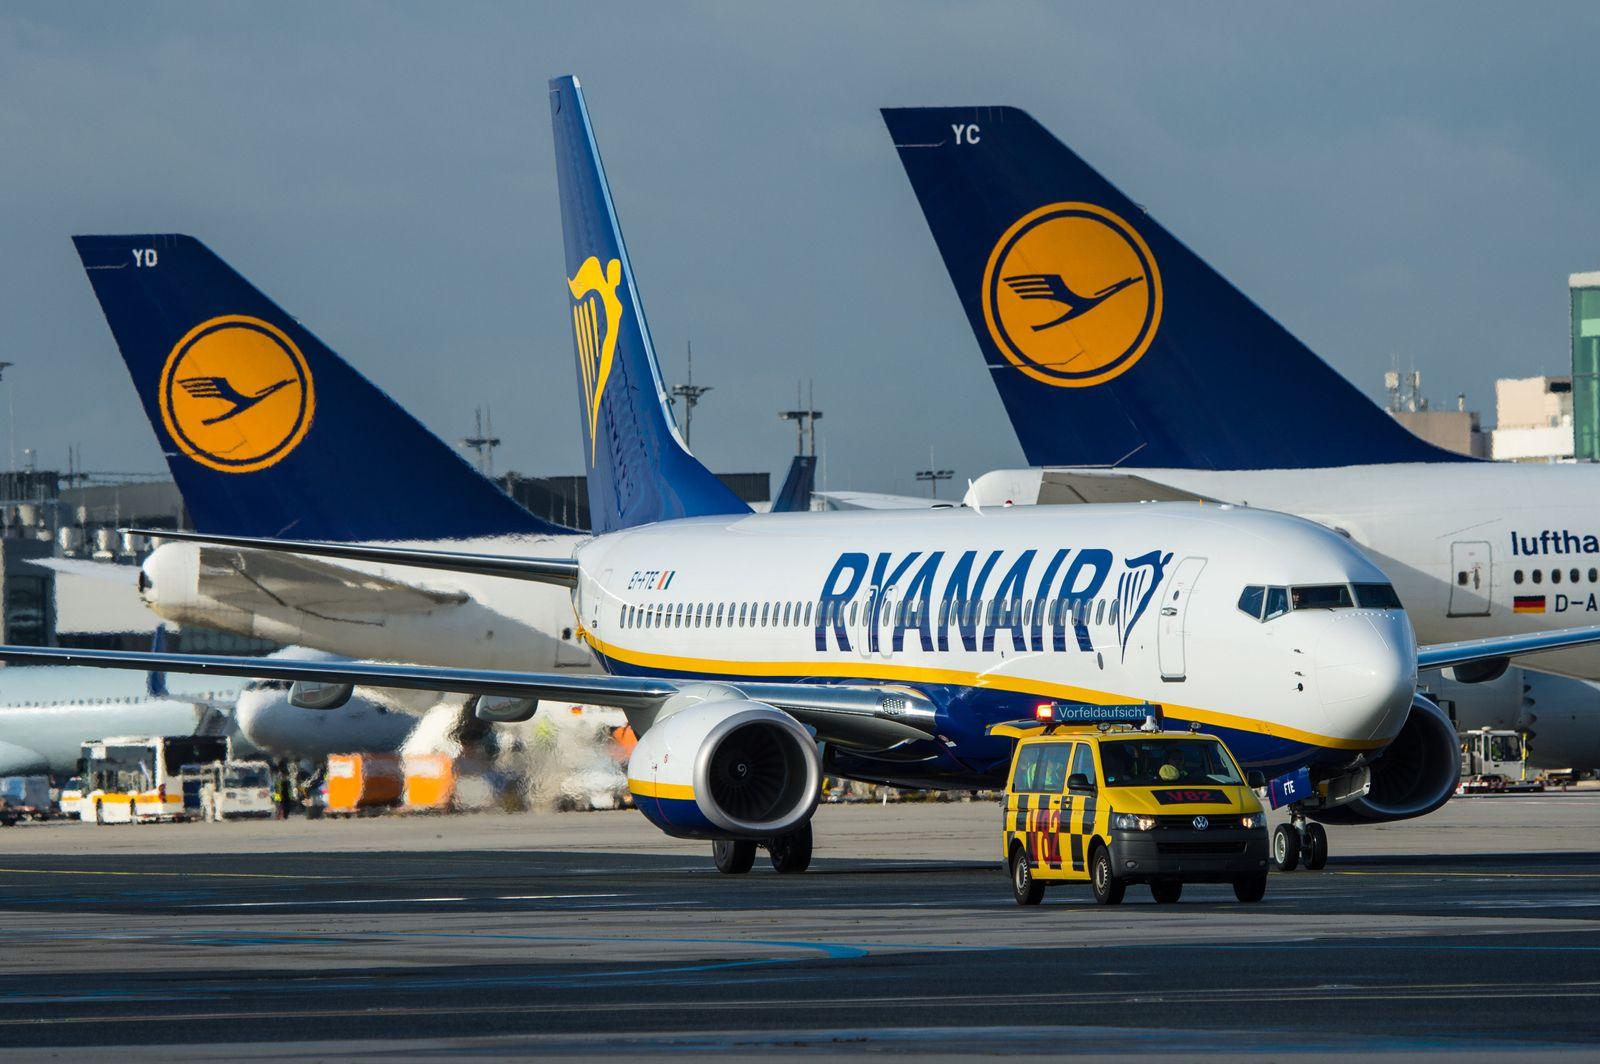 Ryanair / Frankfurt